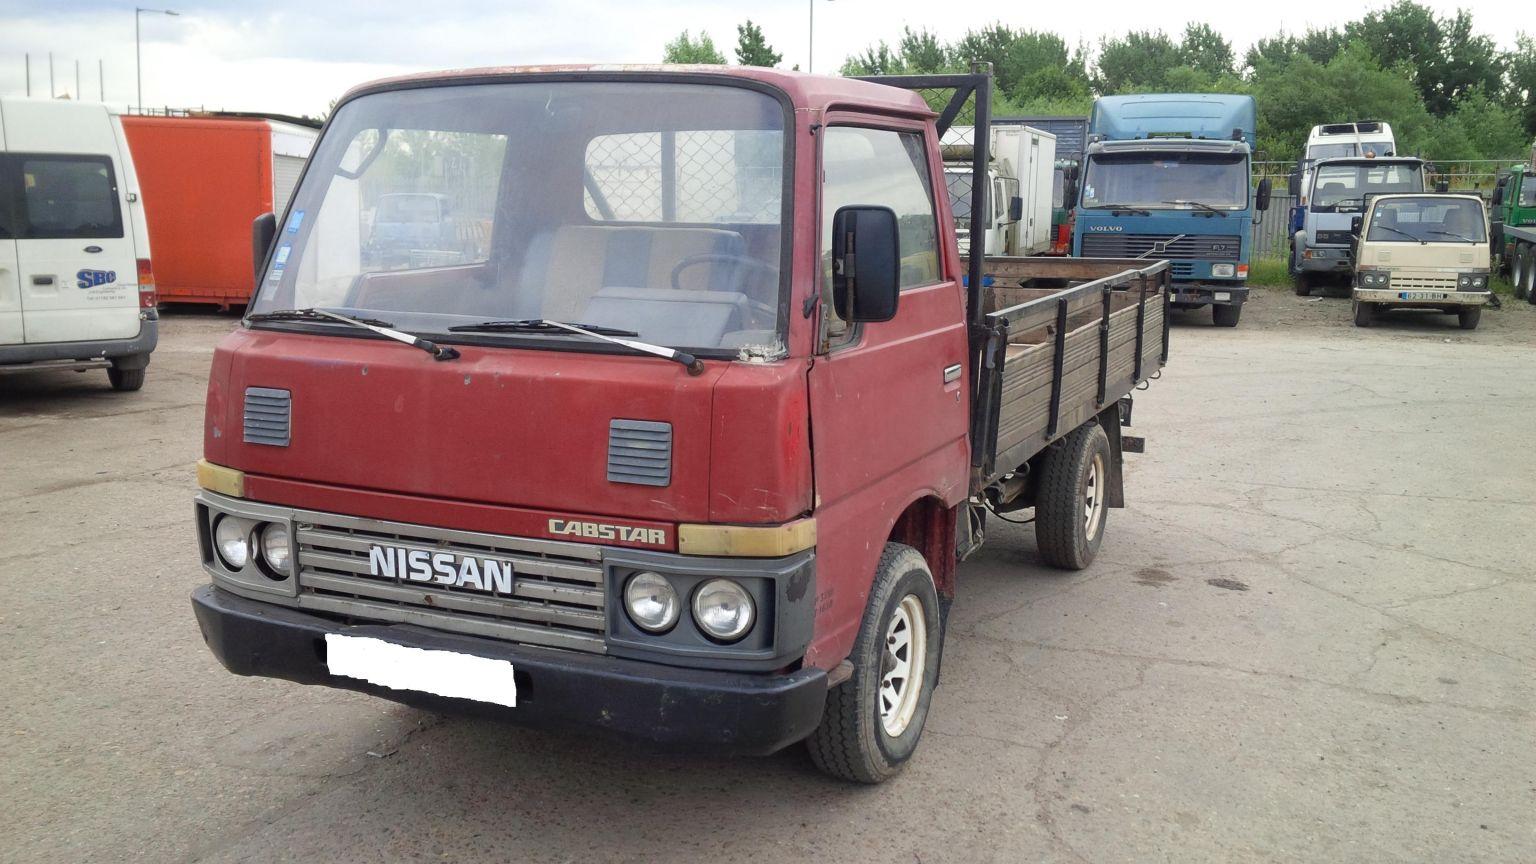 LHD Nissan Cabstar